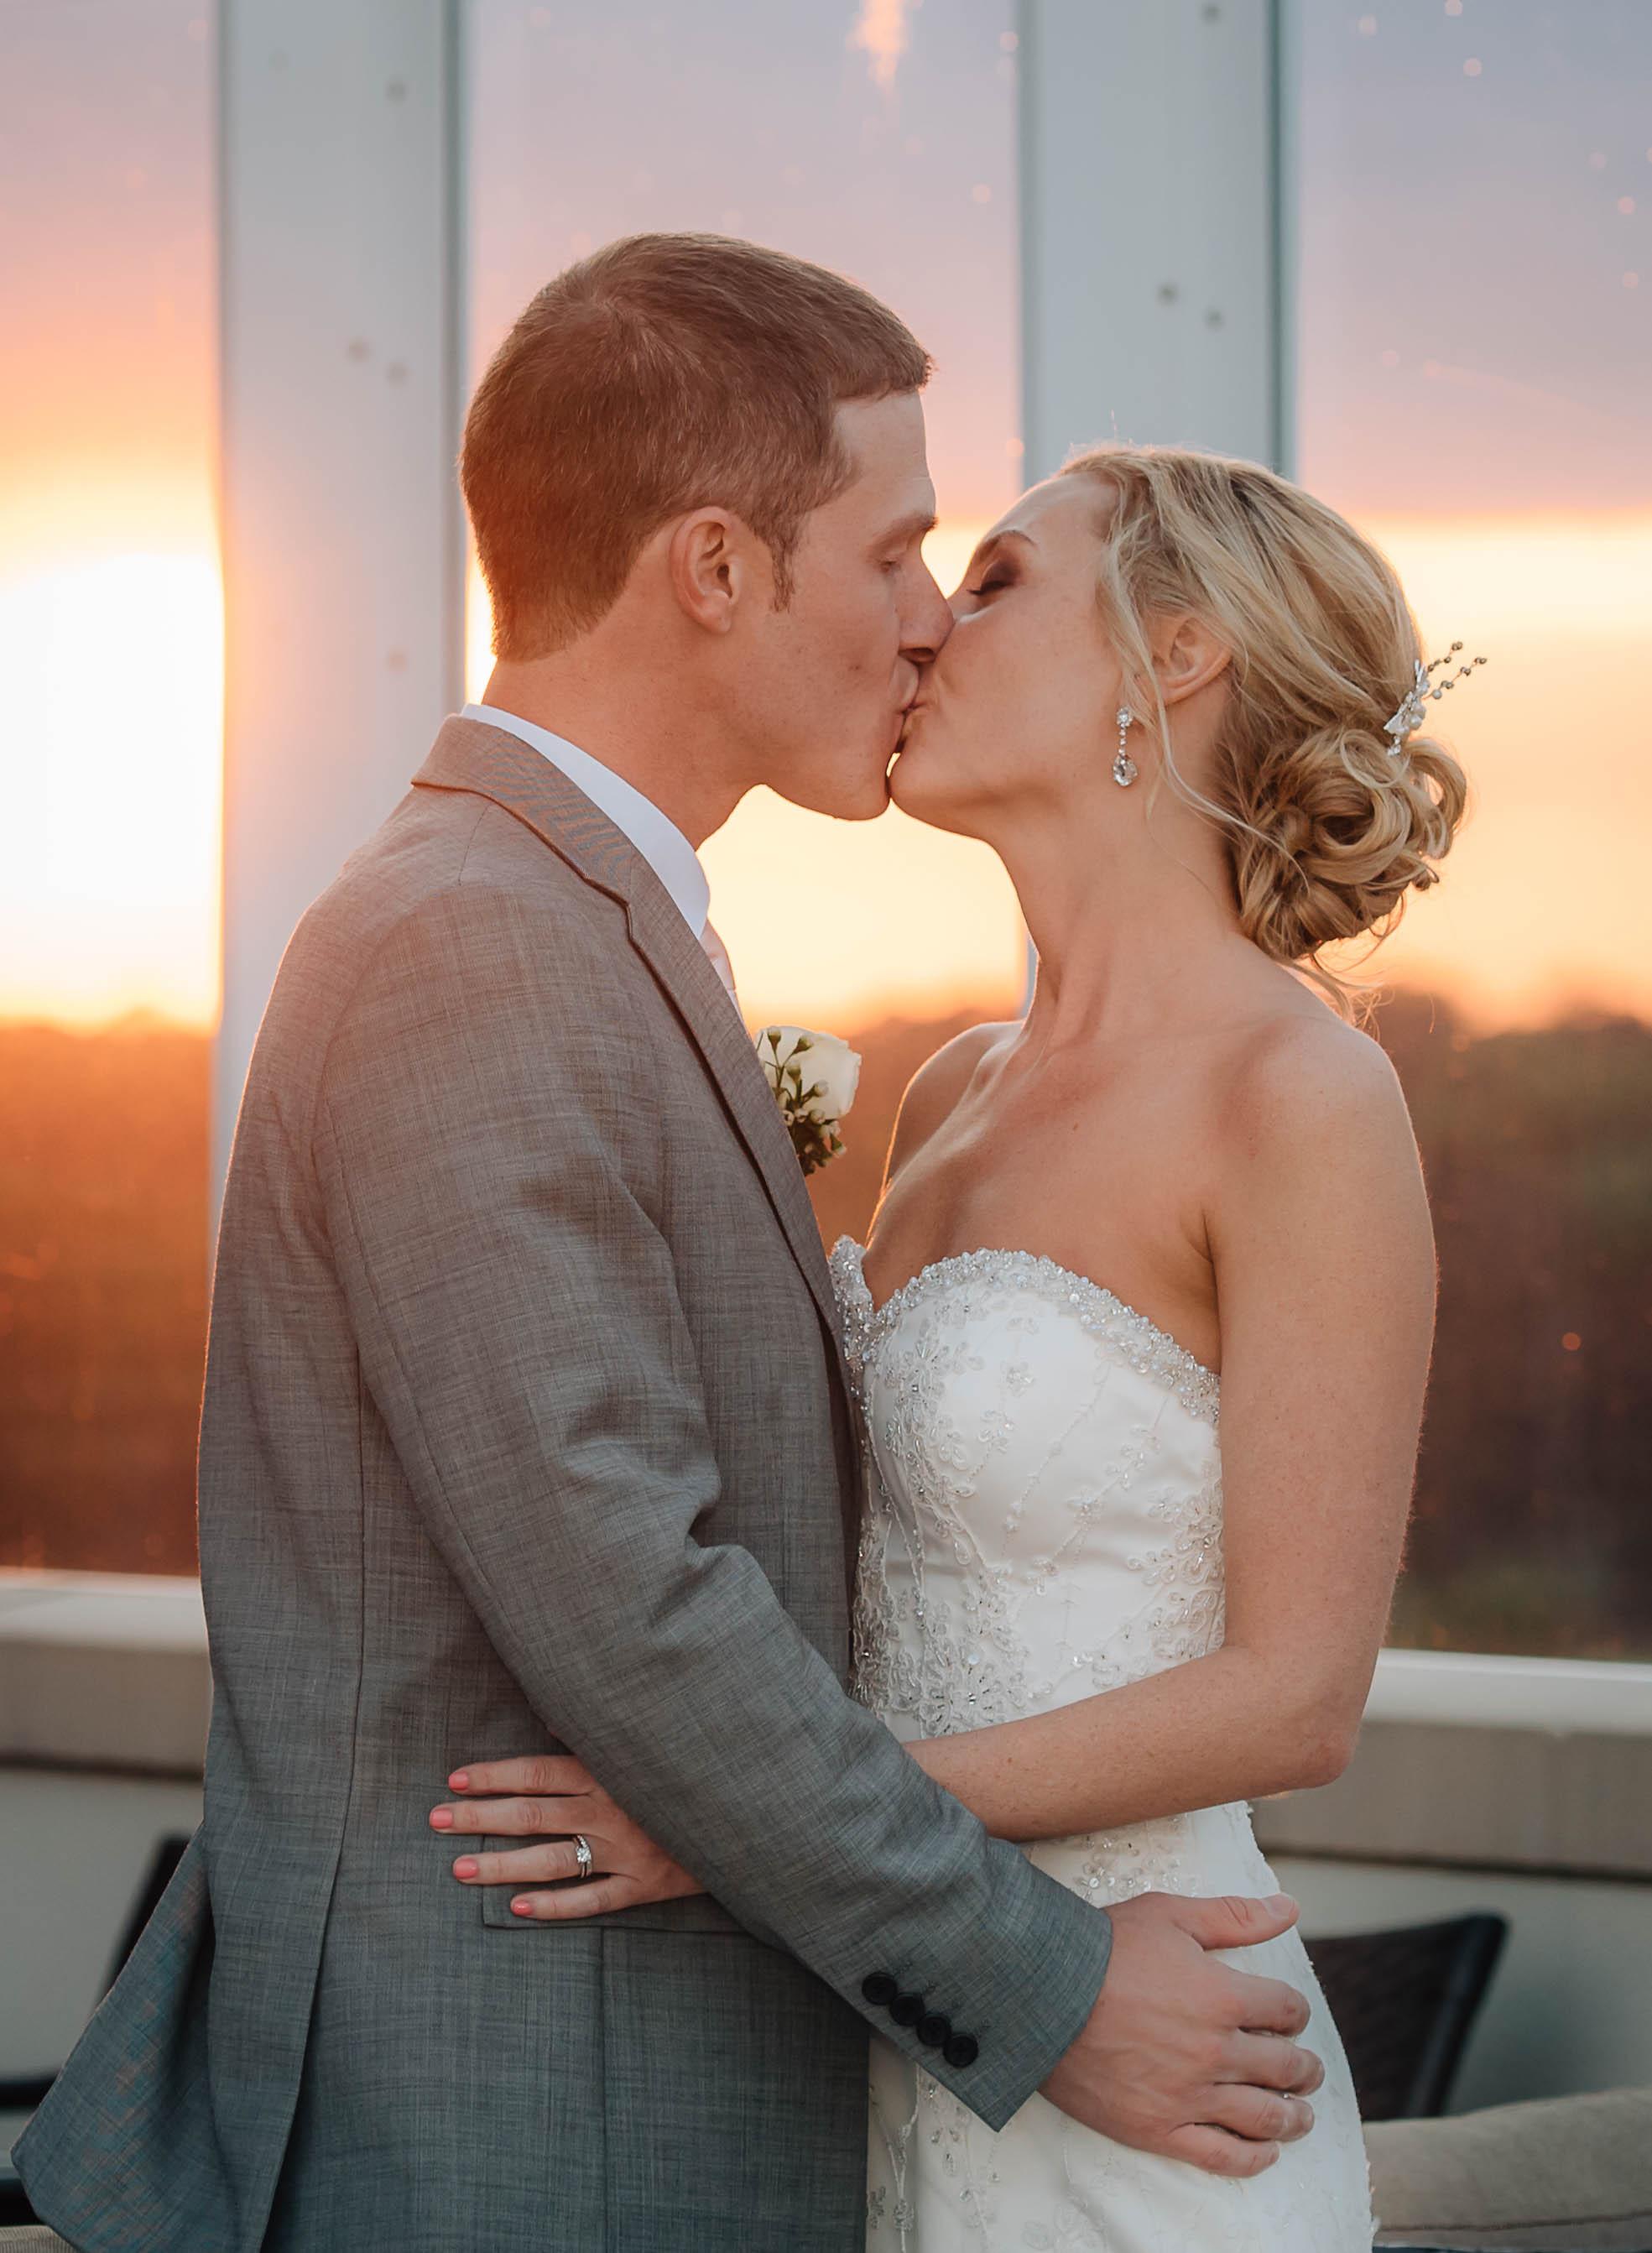 virginia-beach-wedding-photographer-sunset-beach-wedding-melissa-bliss-photography-norfolk-portsmouth-chesapeake-sandbridge-top-wedding-photogaphers